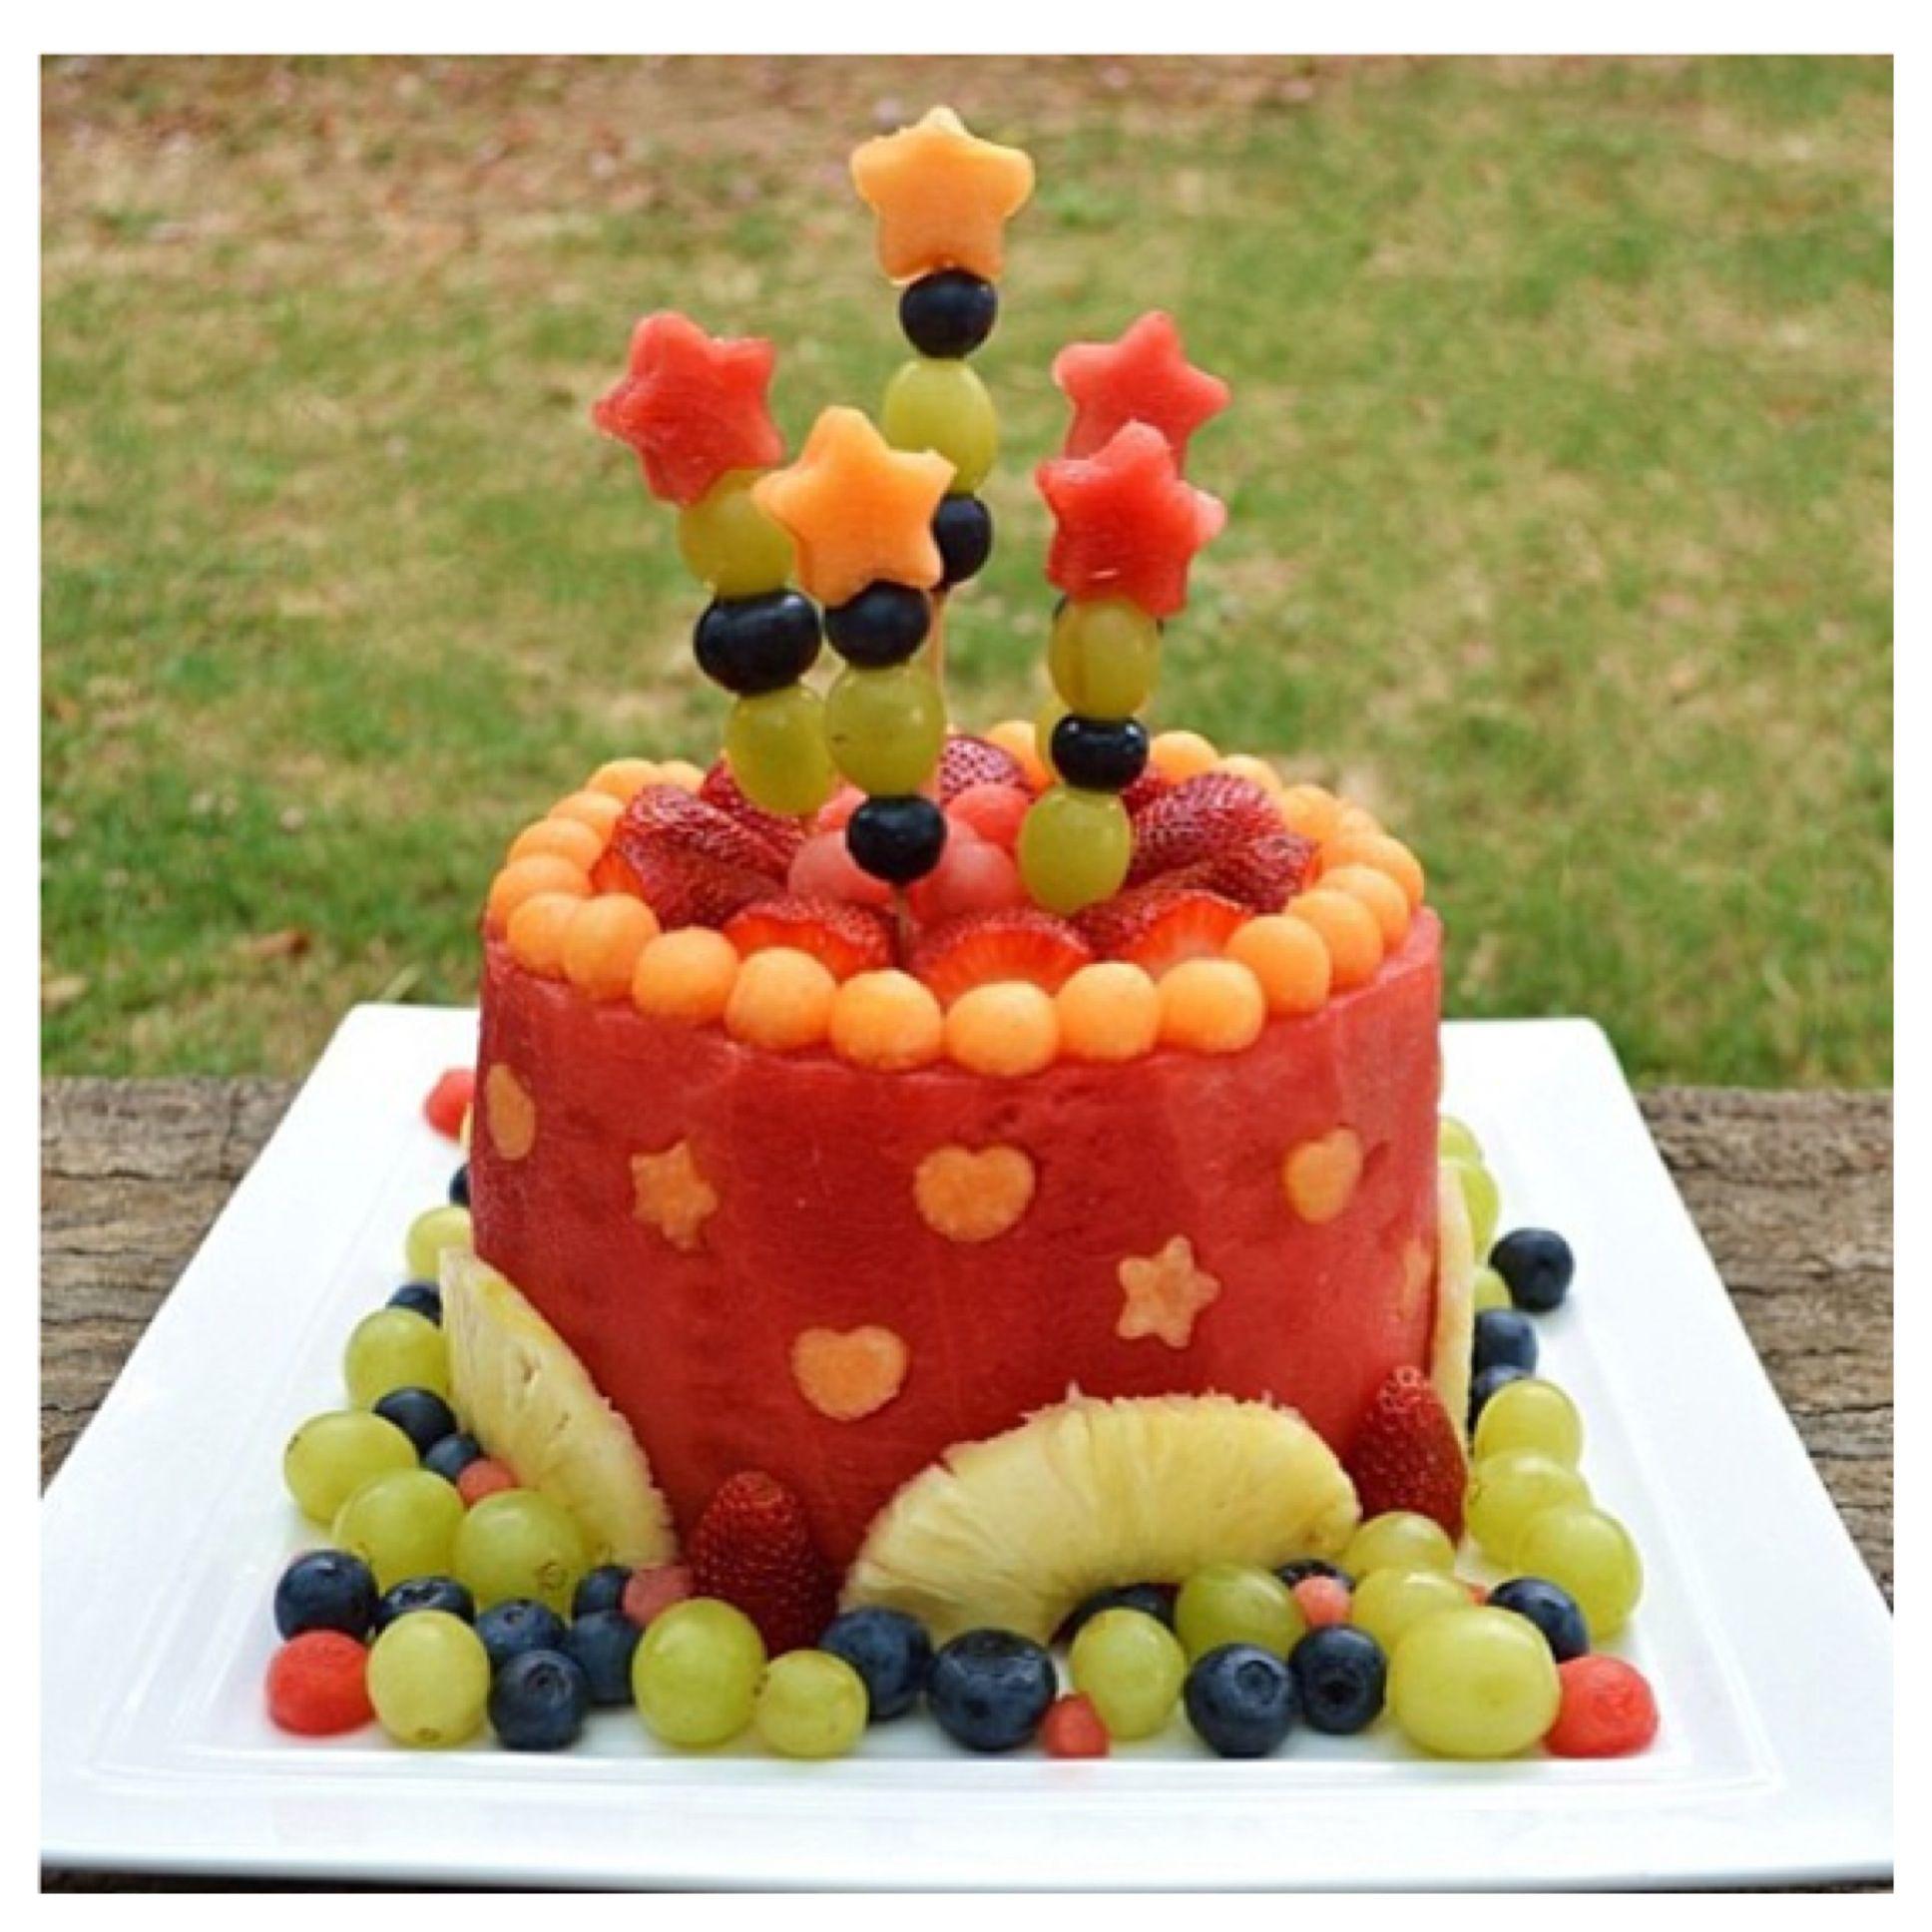 Fabulous Watermelon Ideas For Summer BBQs Watermelon cakes Cake